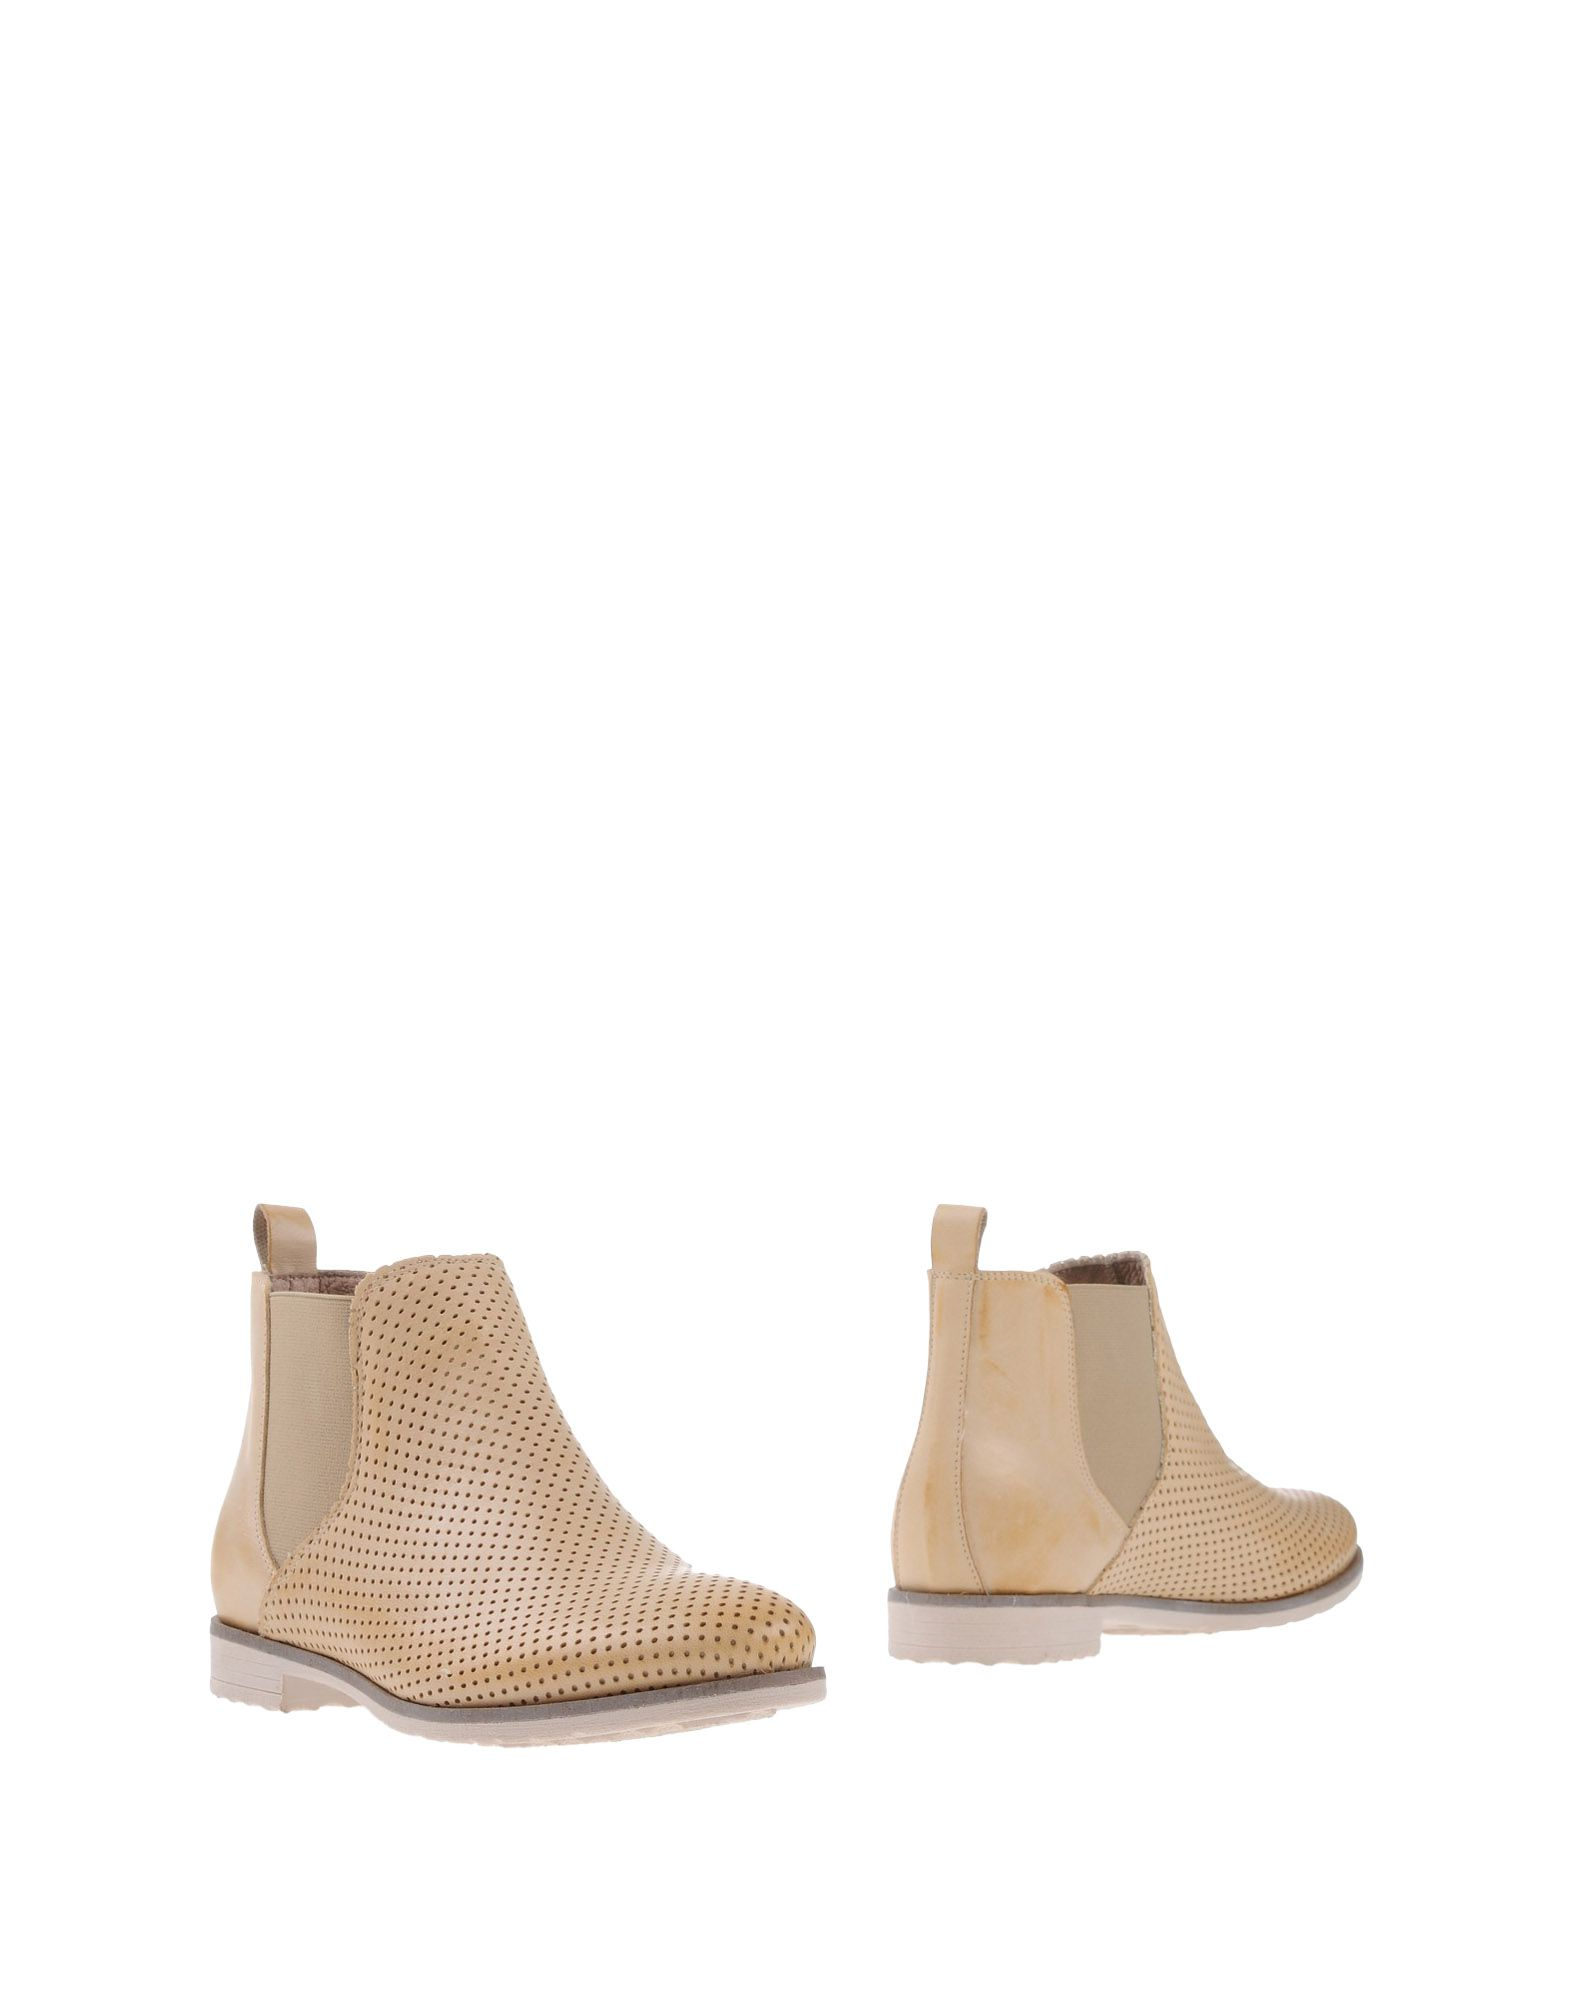 Nila & Nila Chelsea Boots Boots Boots Damen  11347372KV Heiße Schuhe f57d08